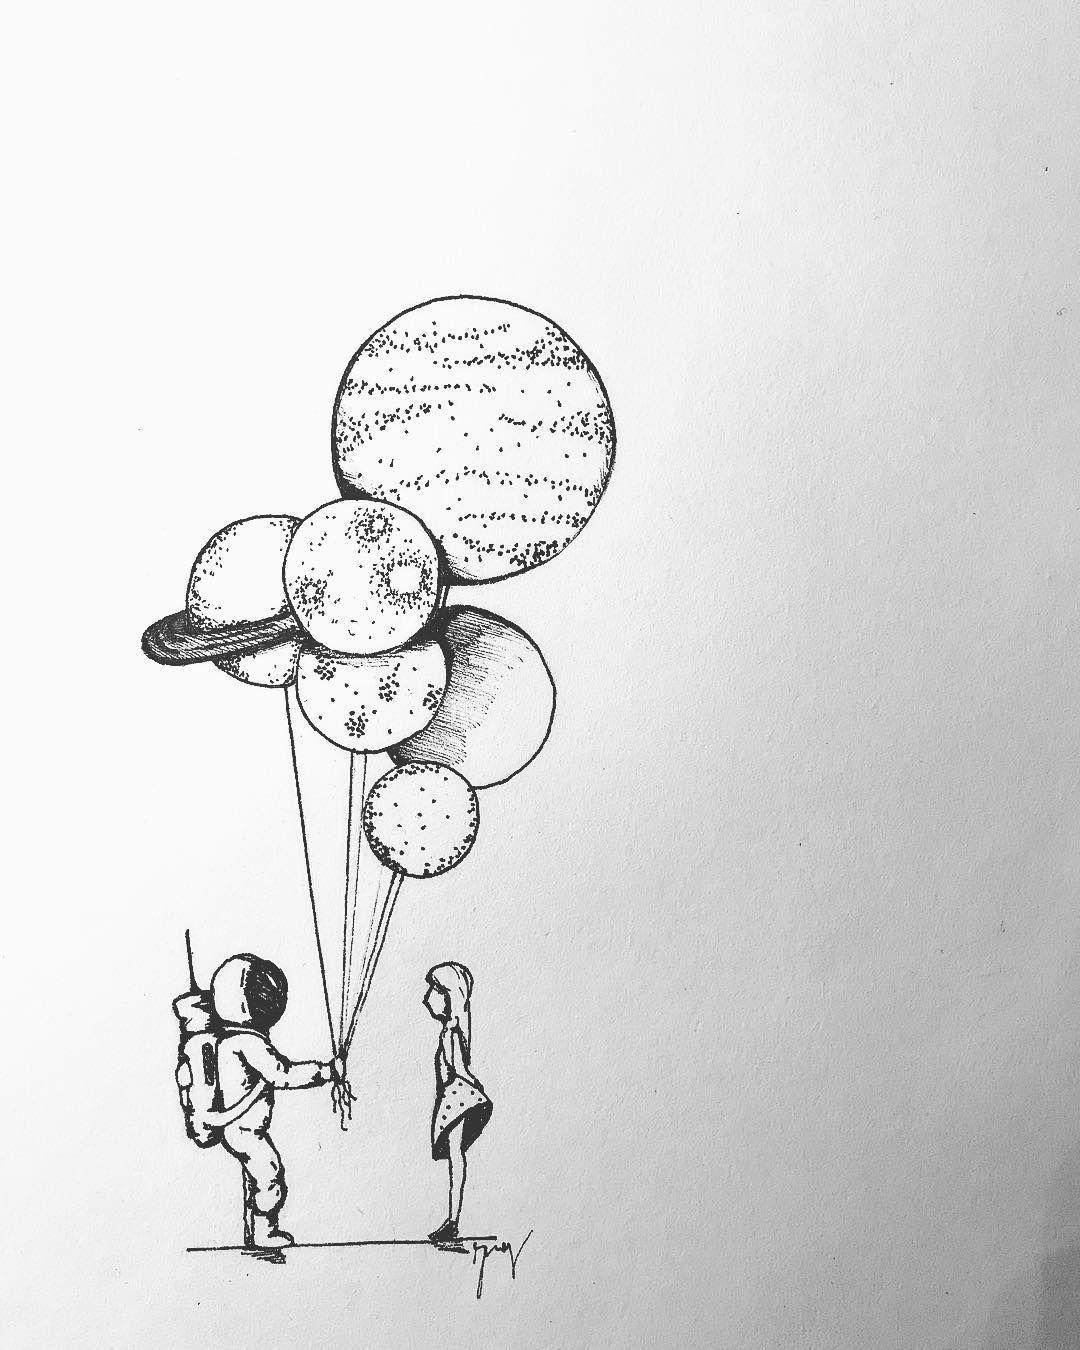 Houston M Arrangio Draw Paint Planets Sketch Art Universe Galaxy Arte Doodle Disegno Arte Disegni Artistici